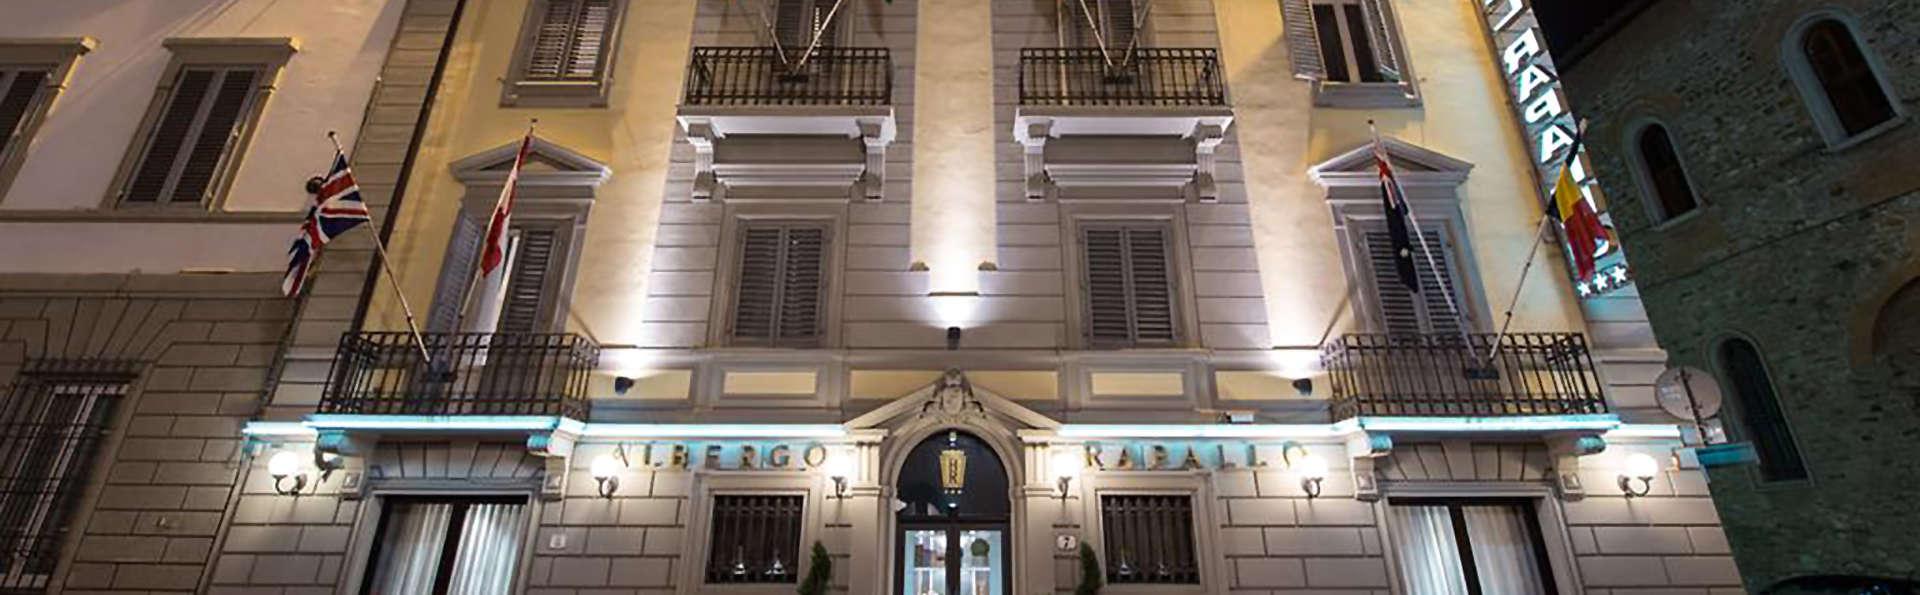 Hotel Rapallo - Edit_Front.jpg